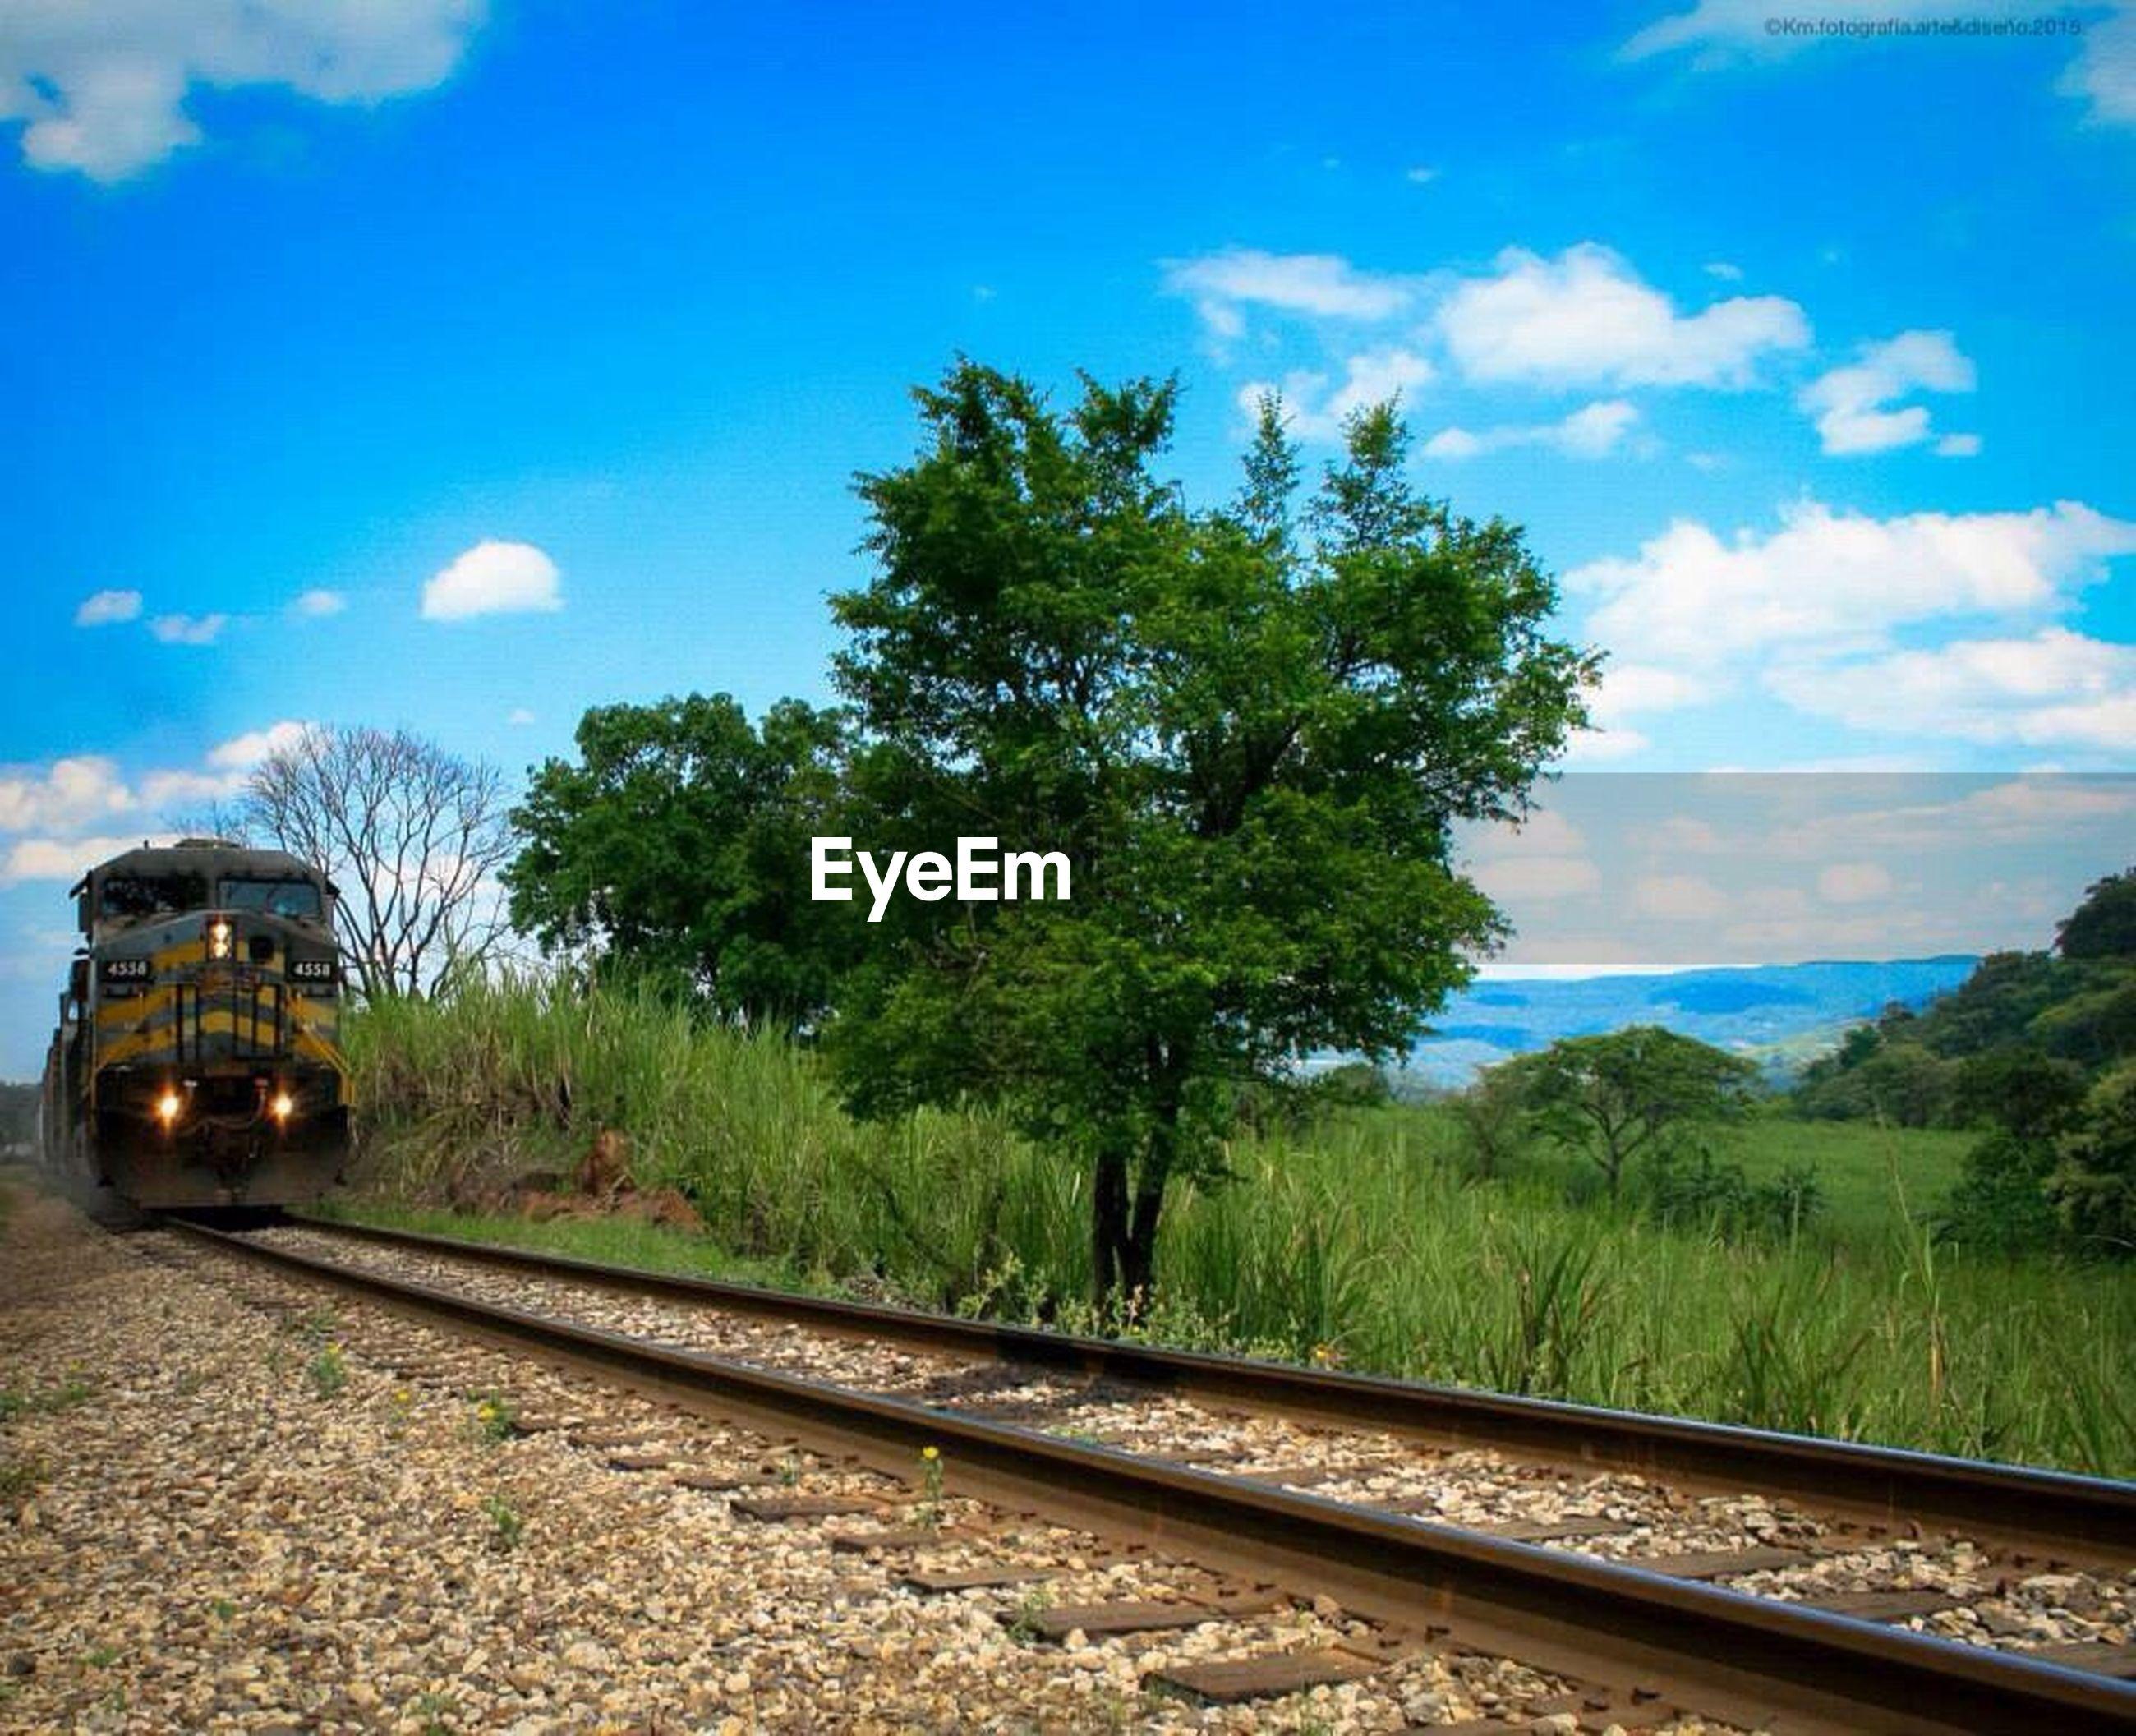 tree, sky, railroad track, transportation, rail transportation, blue, cloud - sky, cloud, landscape, tranquil scene, nature, tranquility, scenics, road, growth, public transportation, sunlight, no people, outdoors, travel